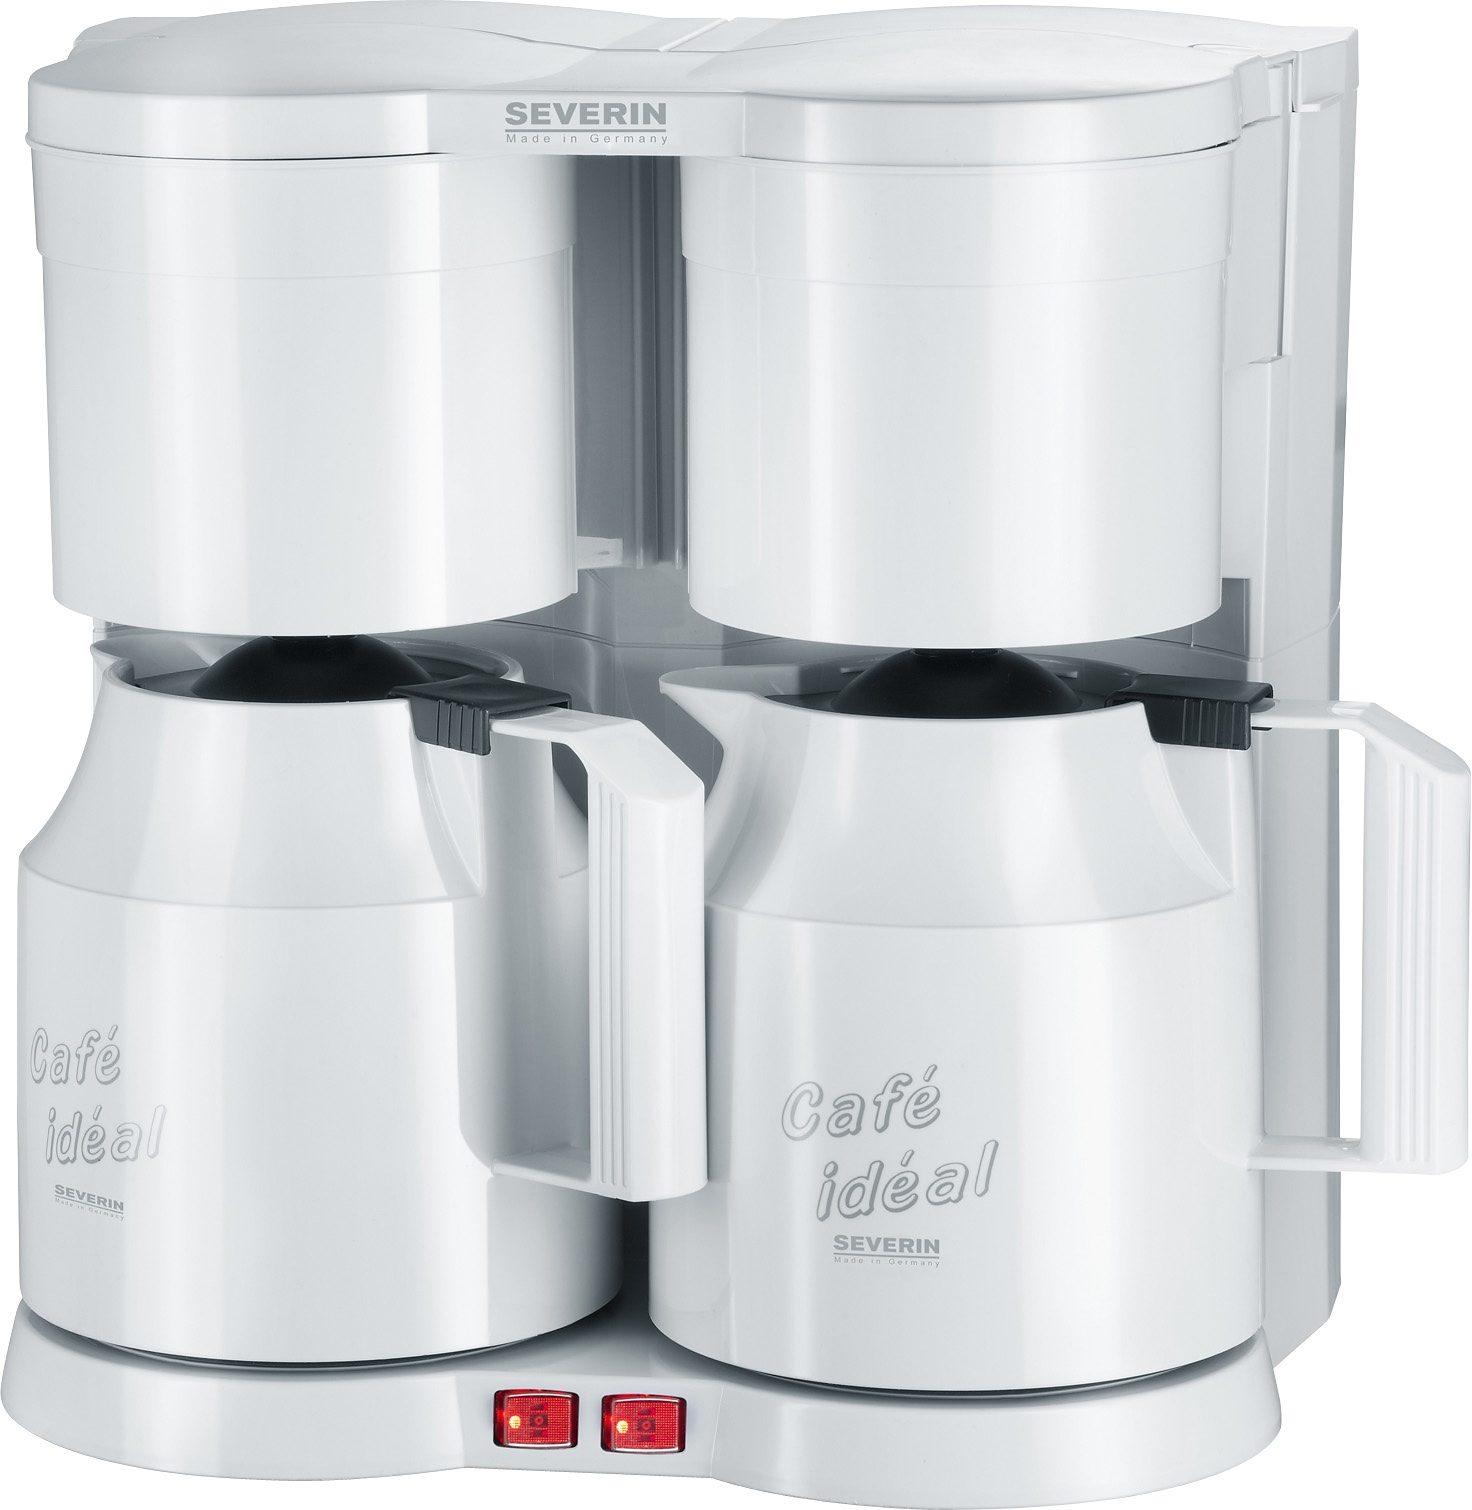 Severin Filterkaffeemaschine Duo-Kaffeeautomat KA 5827, 1,2l Kaffeekanne, Papierfilter 1x4, mit 2 Thermokannen